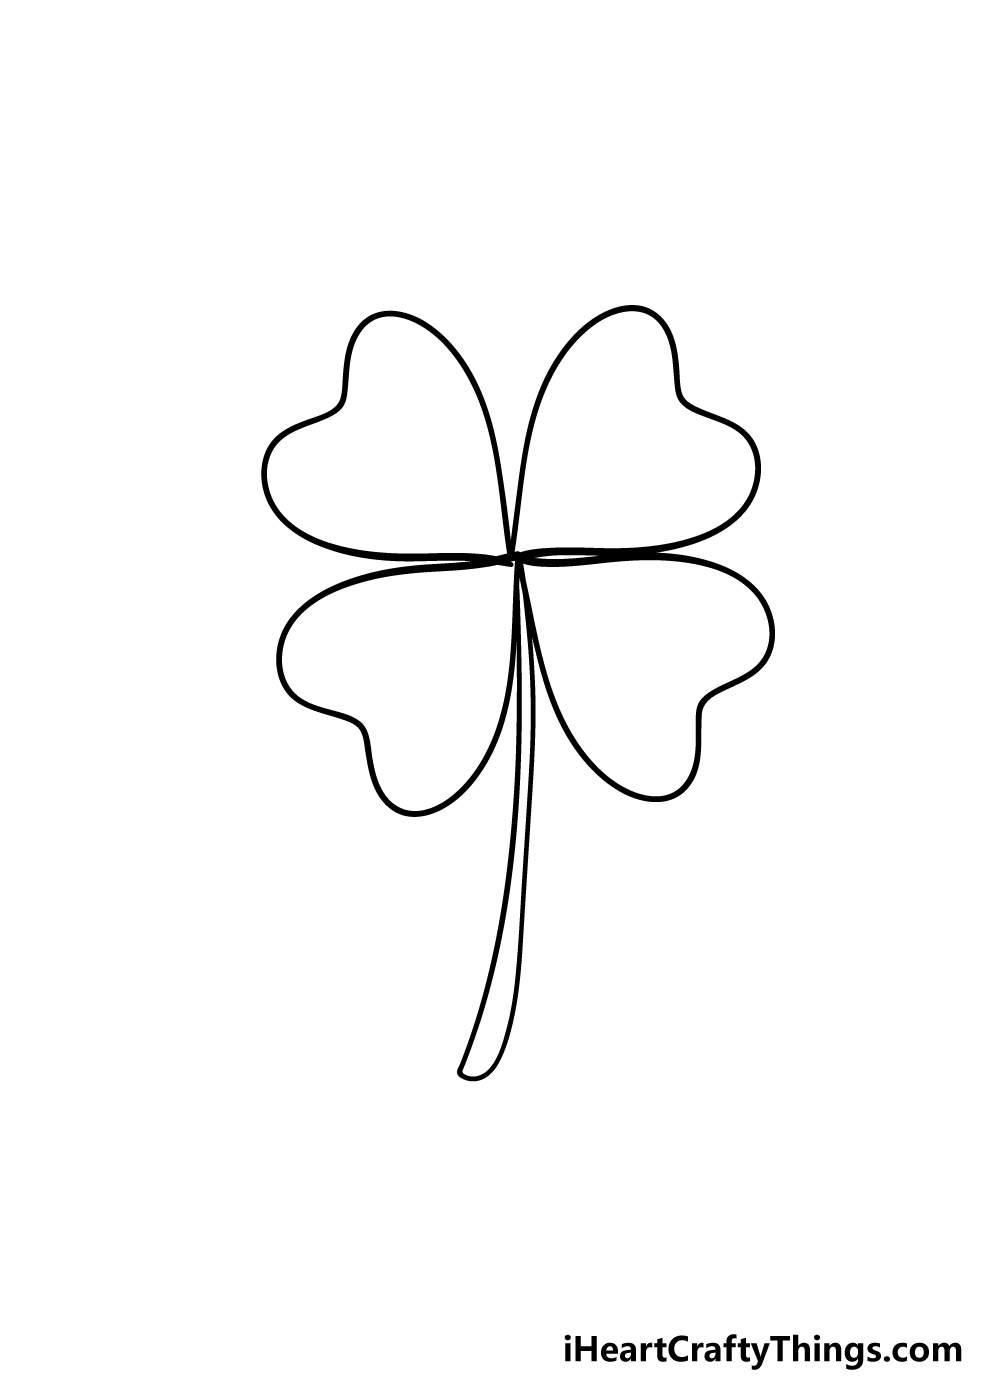 drawing four-leaf clover step 5